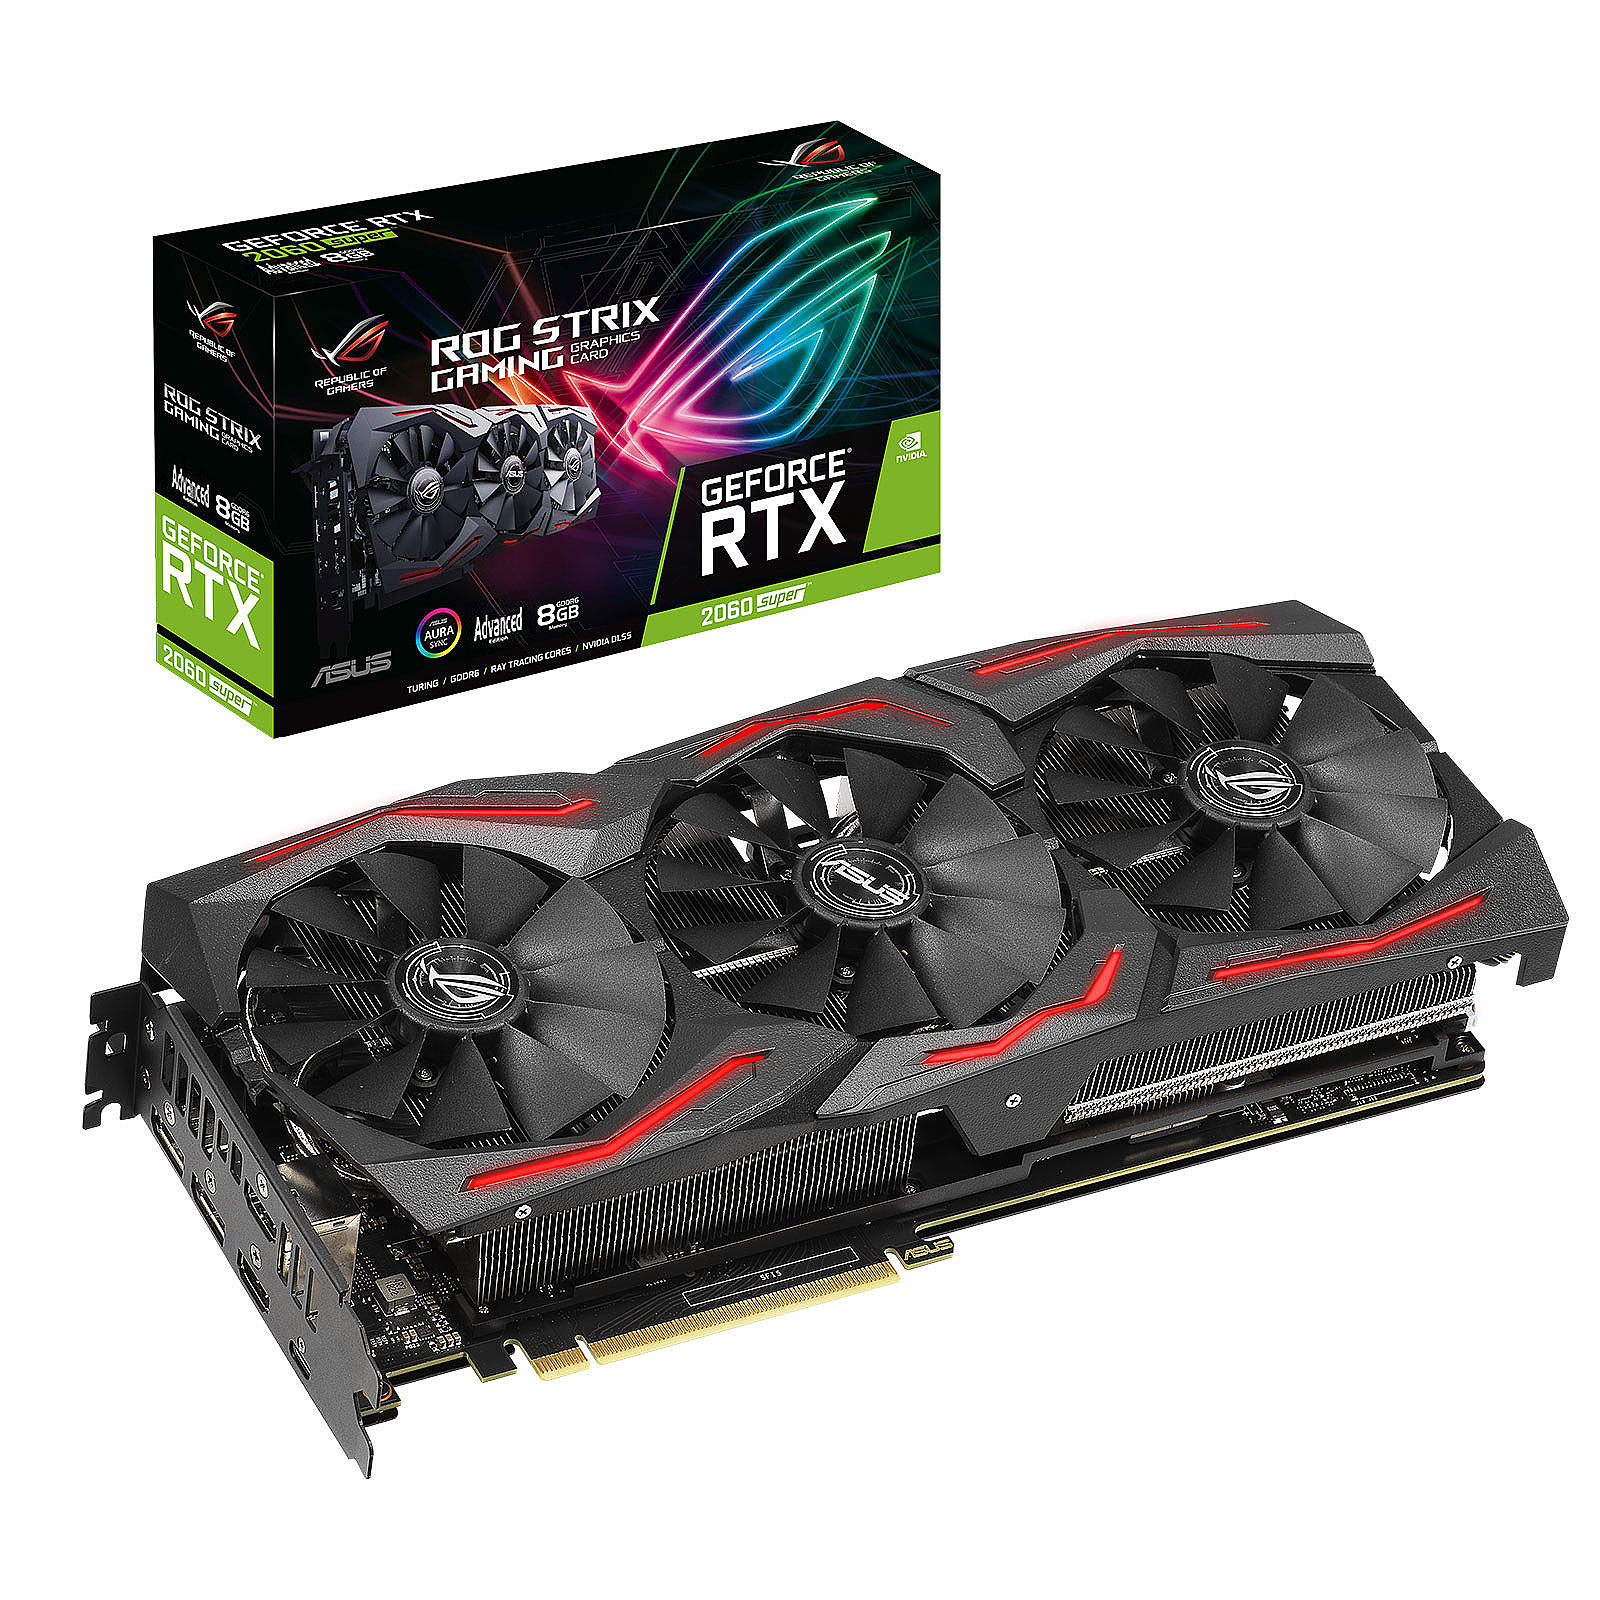 ASUS GeForce RTX 2060 SUPER ROG-STRIX-RTX2060S-A8G-EVO-GAMING